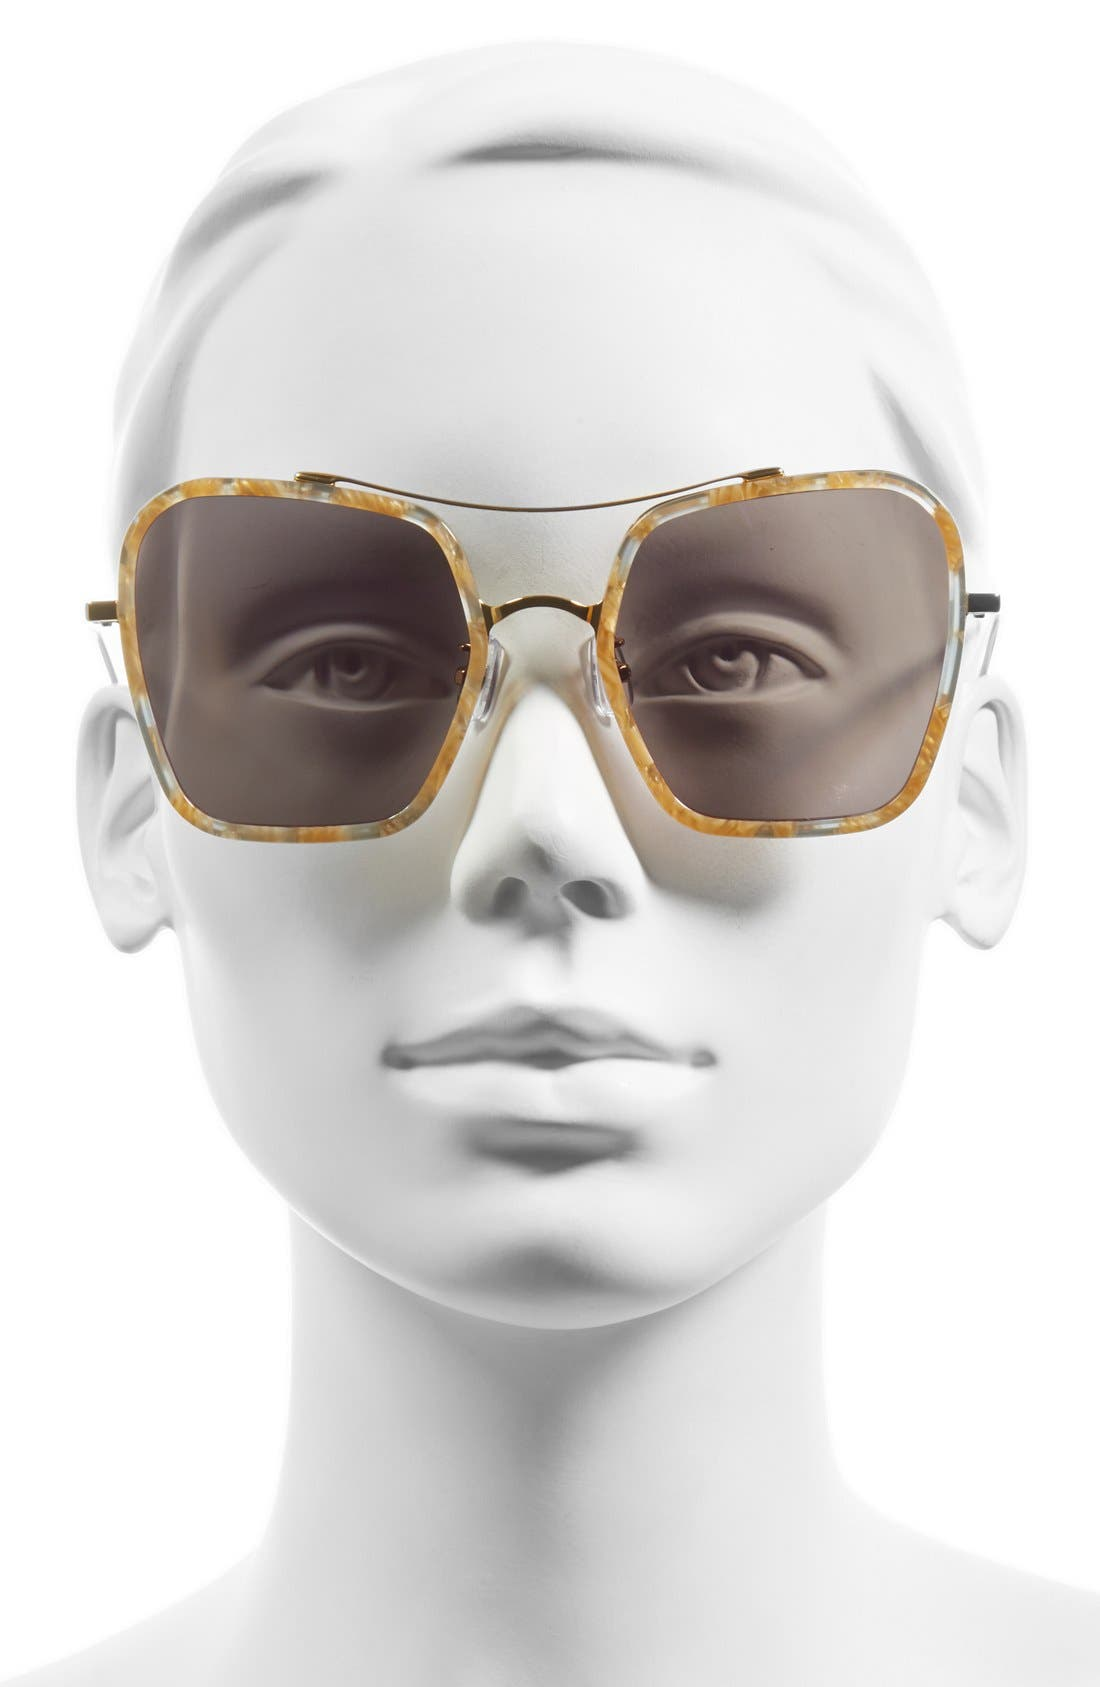 53mm Retro Square Sunglasses,                             Alternate thumbnail 2, color,                             200